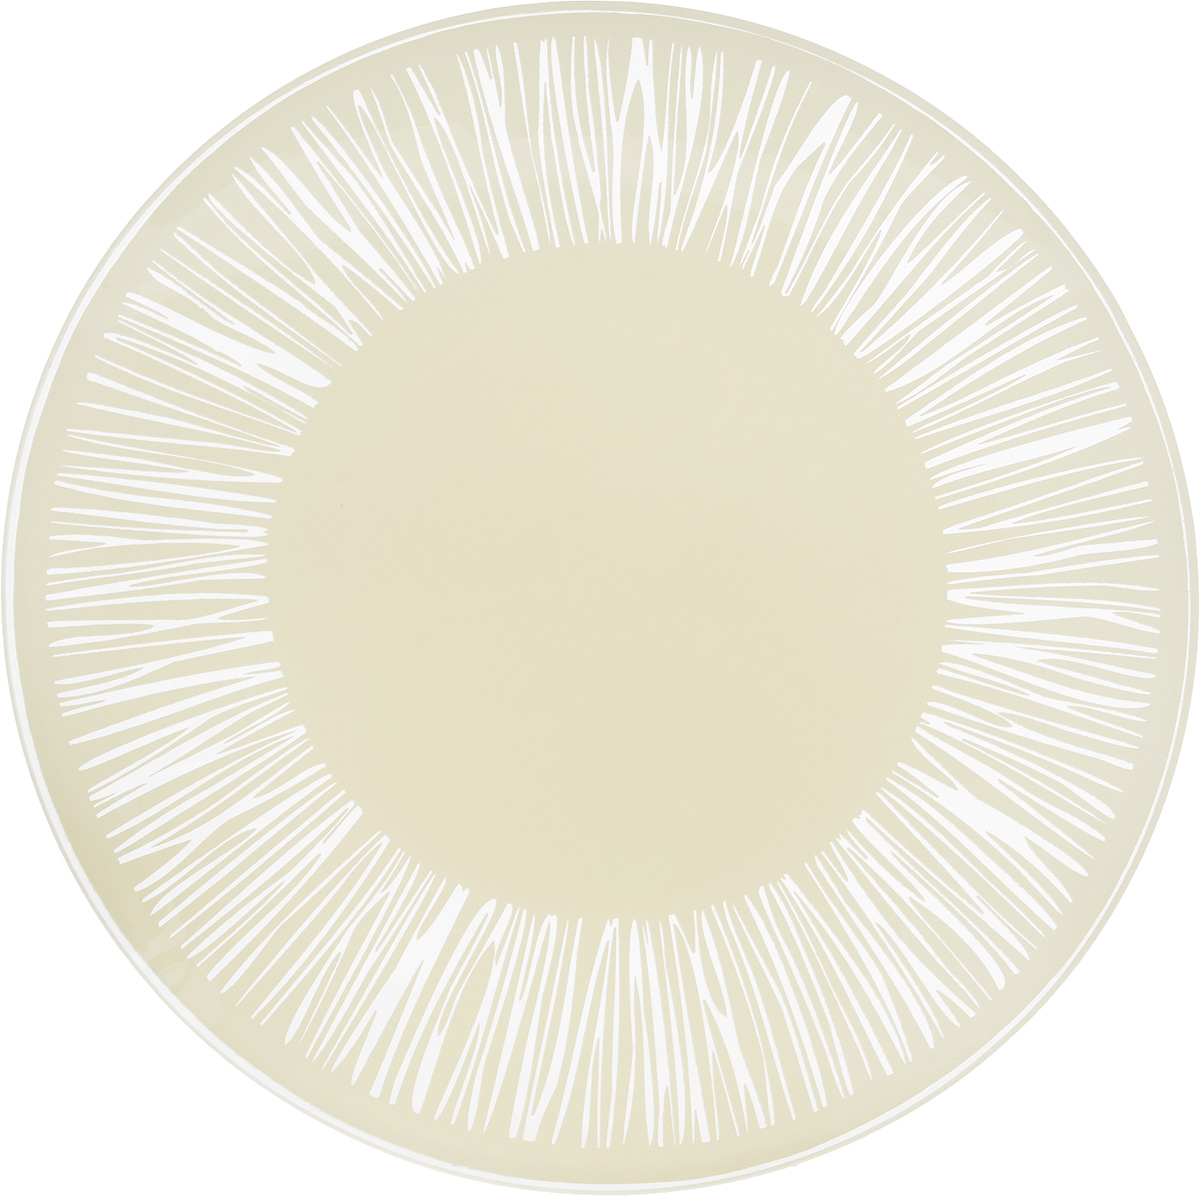 "Тарелка NiNaGlass ""Витас"", цвет: светло-бежевый, диаметр 20 см"